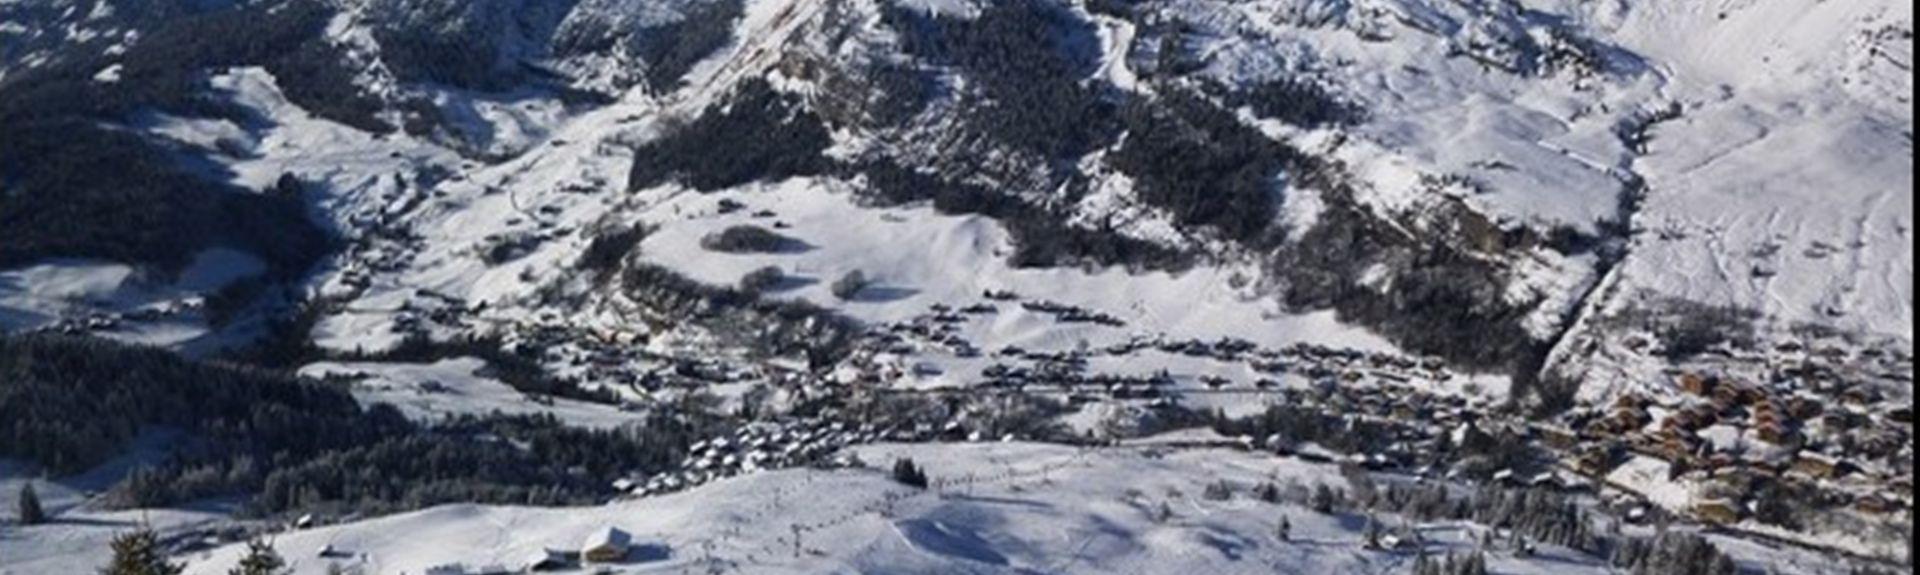 Les Clefs, Ródano-Alpes, França